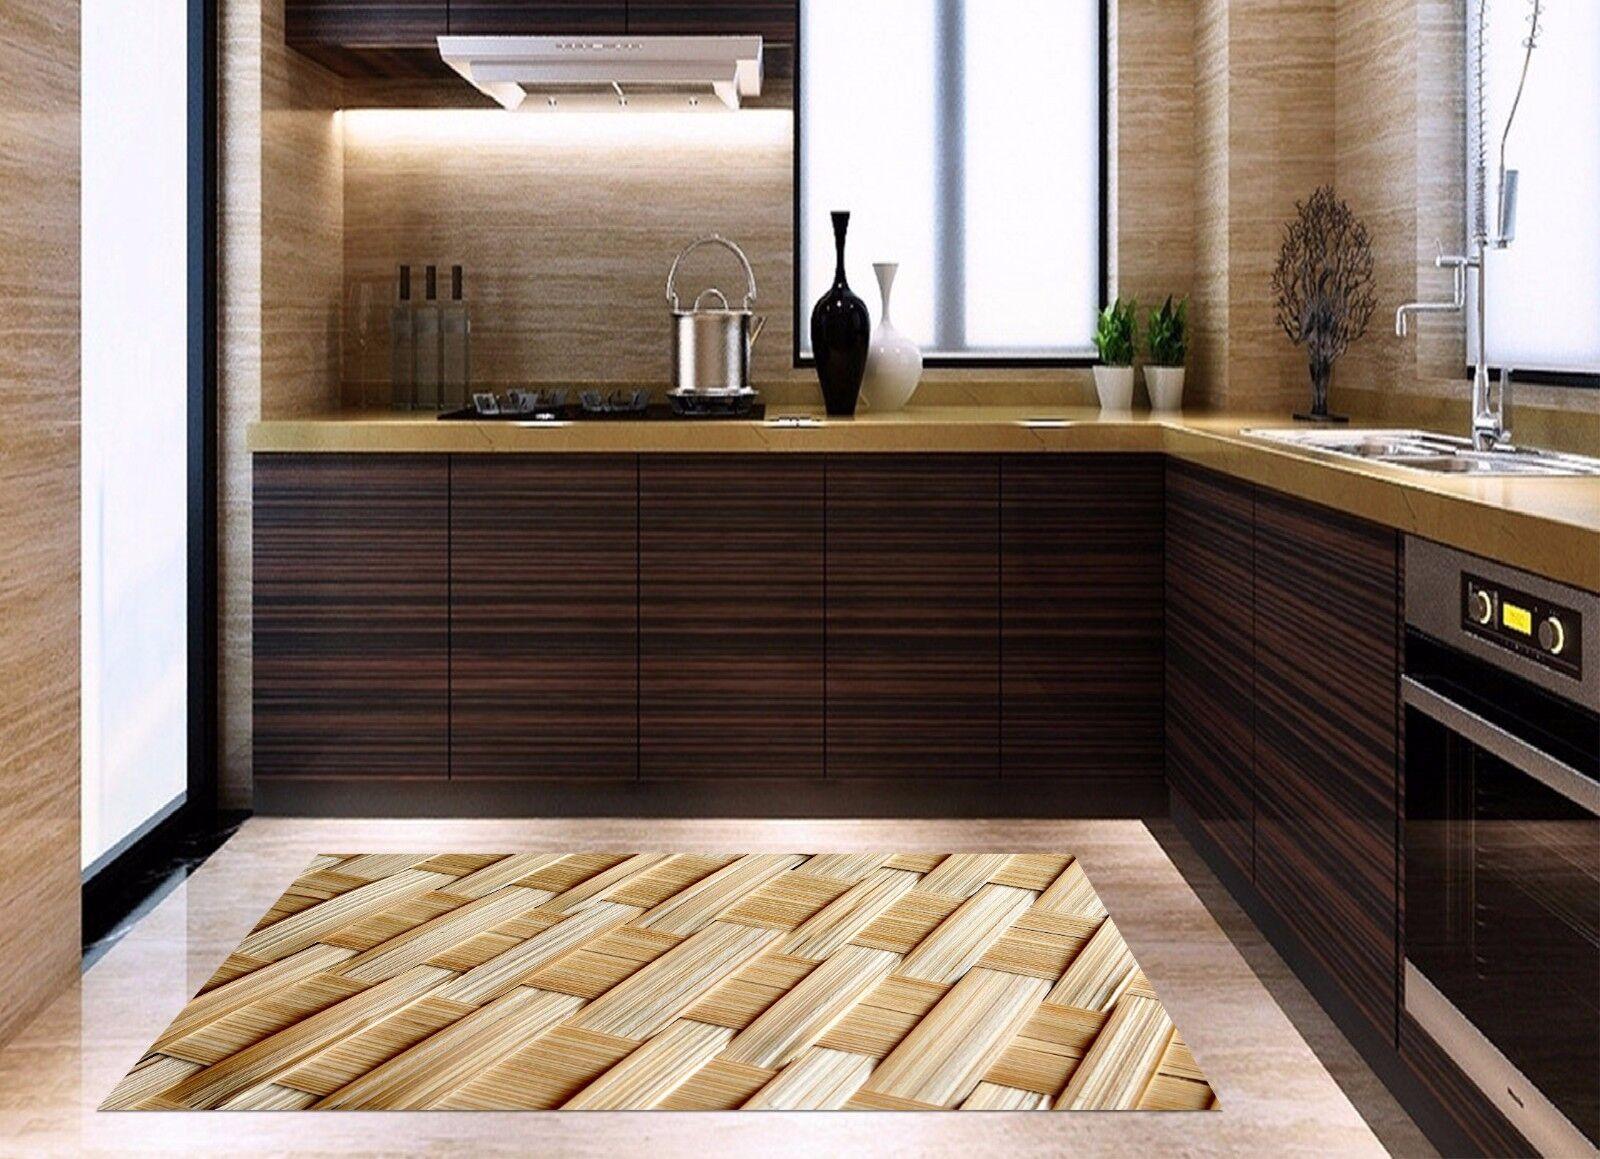 3D Bamboo Weave 2 Kitchen Mat Floor Murals Wall Print Wall Deco AJ WALLPAPER AU